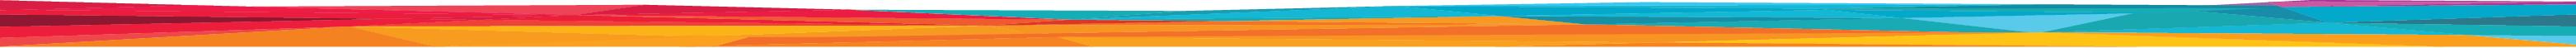 Diseño SubHeader KariCau Marketing